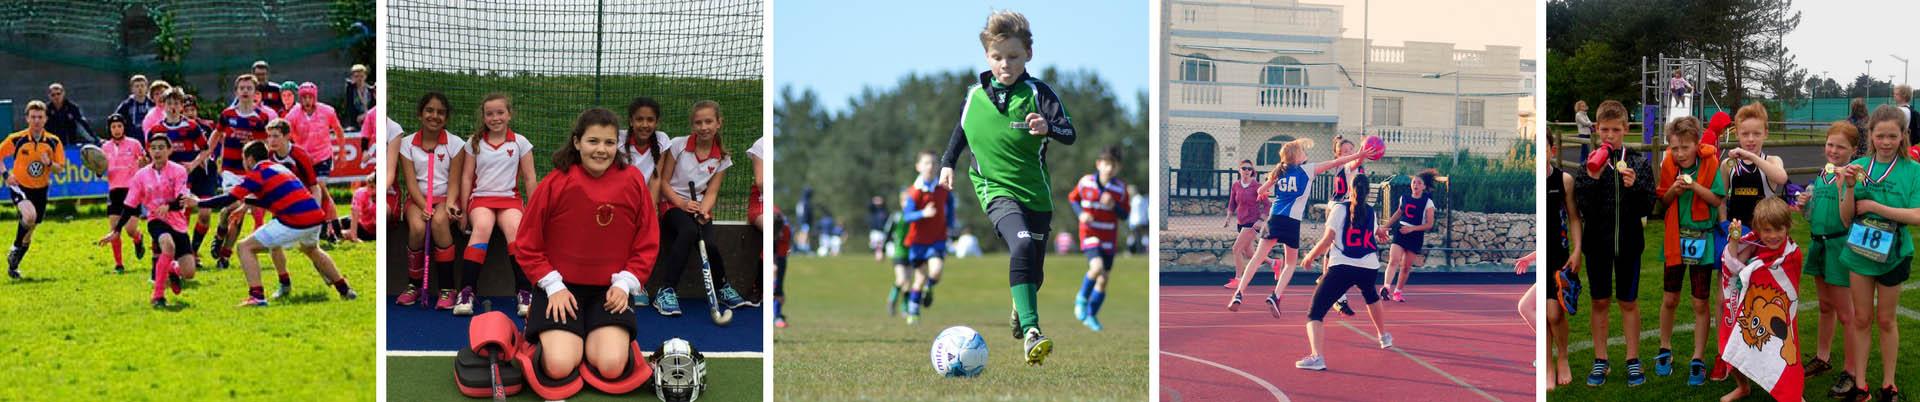 School Sports Tournaments